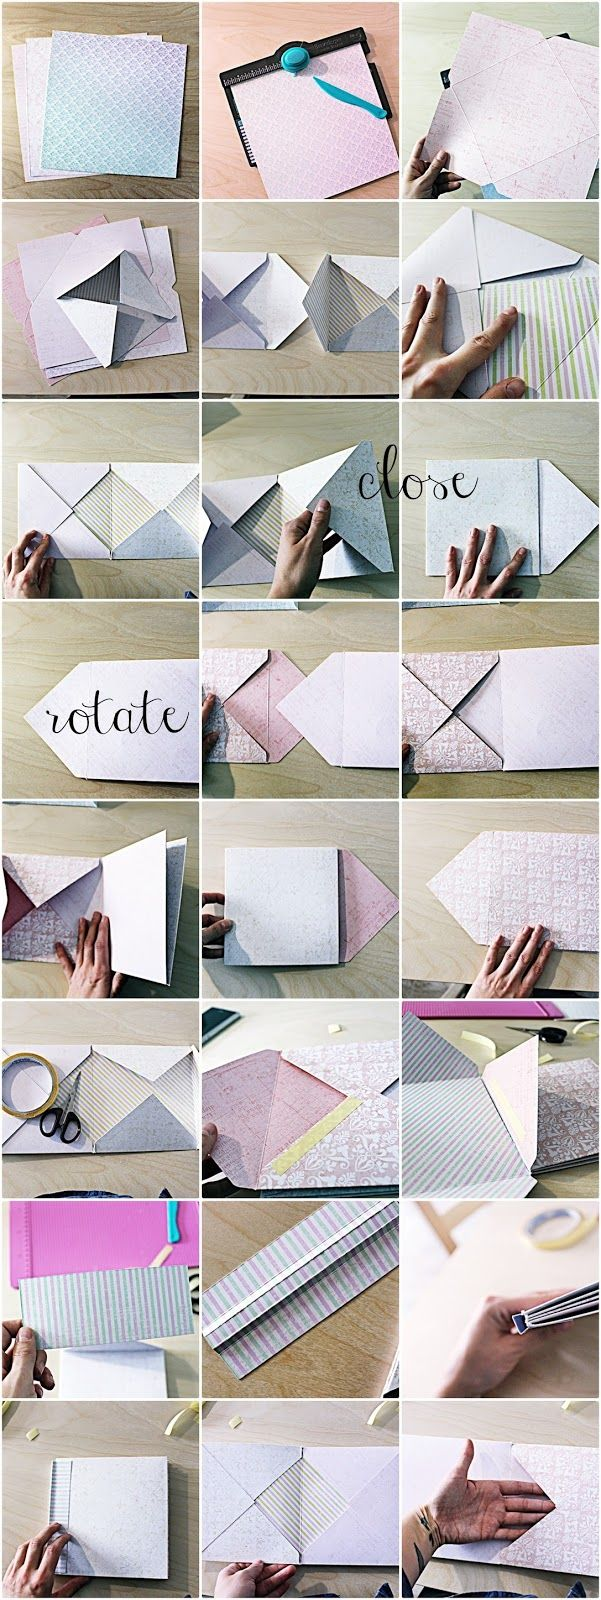 Retro Kraft Shop: Retro Tutki: Album kopertowy Ani / Retro Tutorials: Ania's envelope album